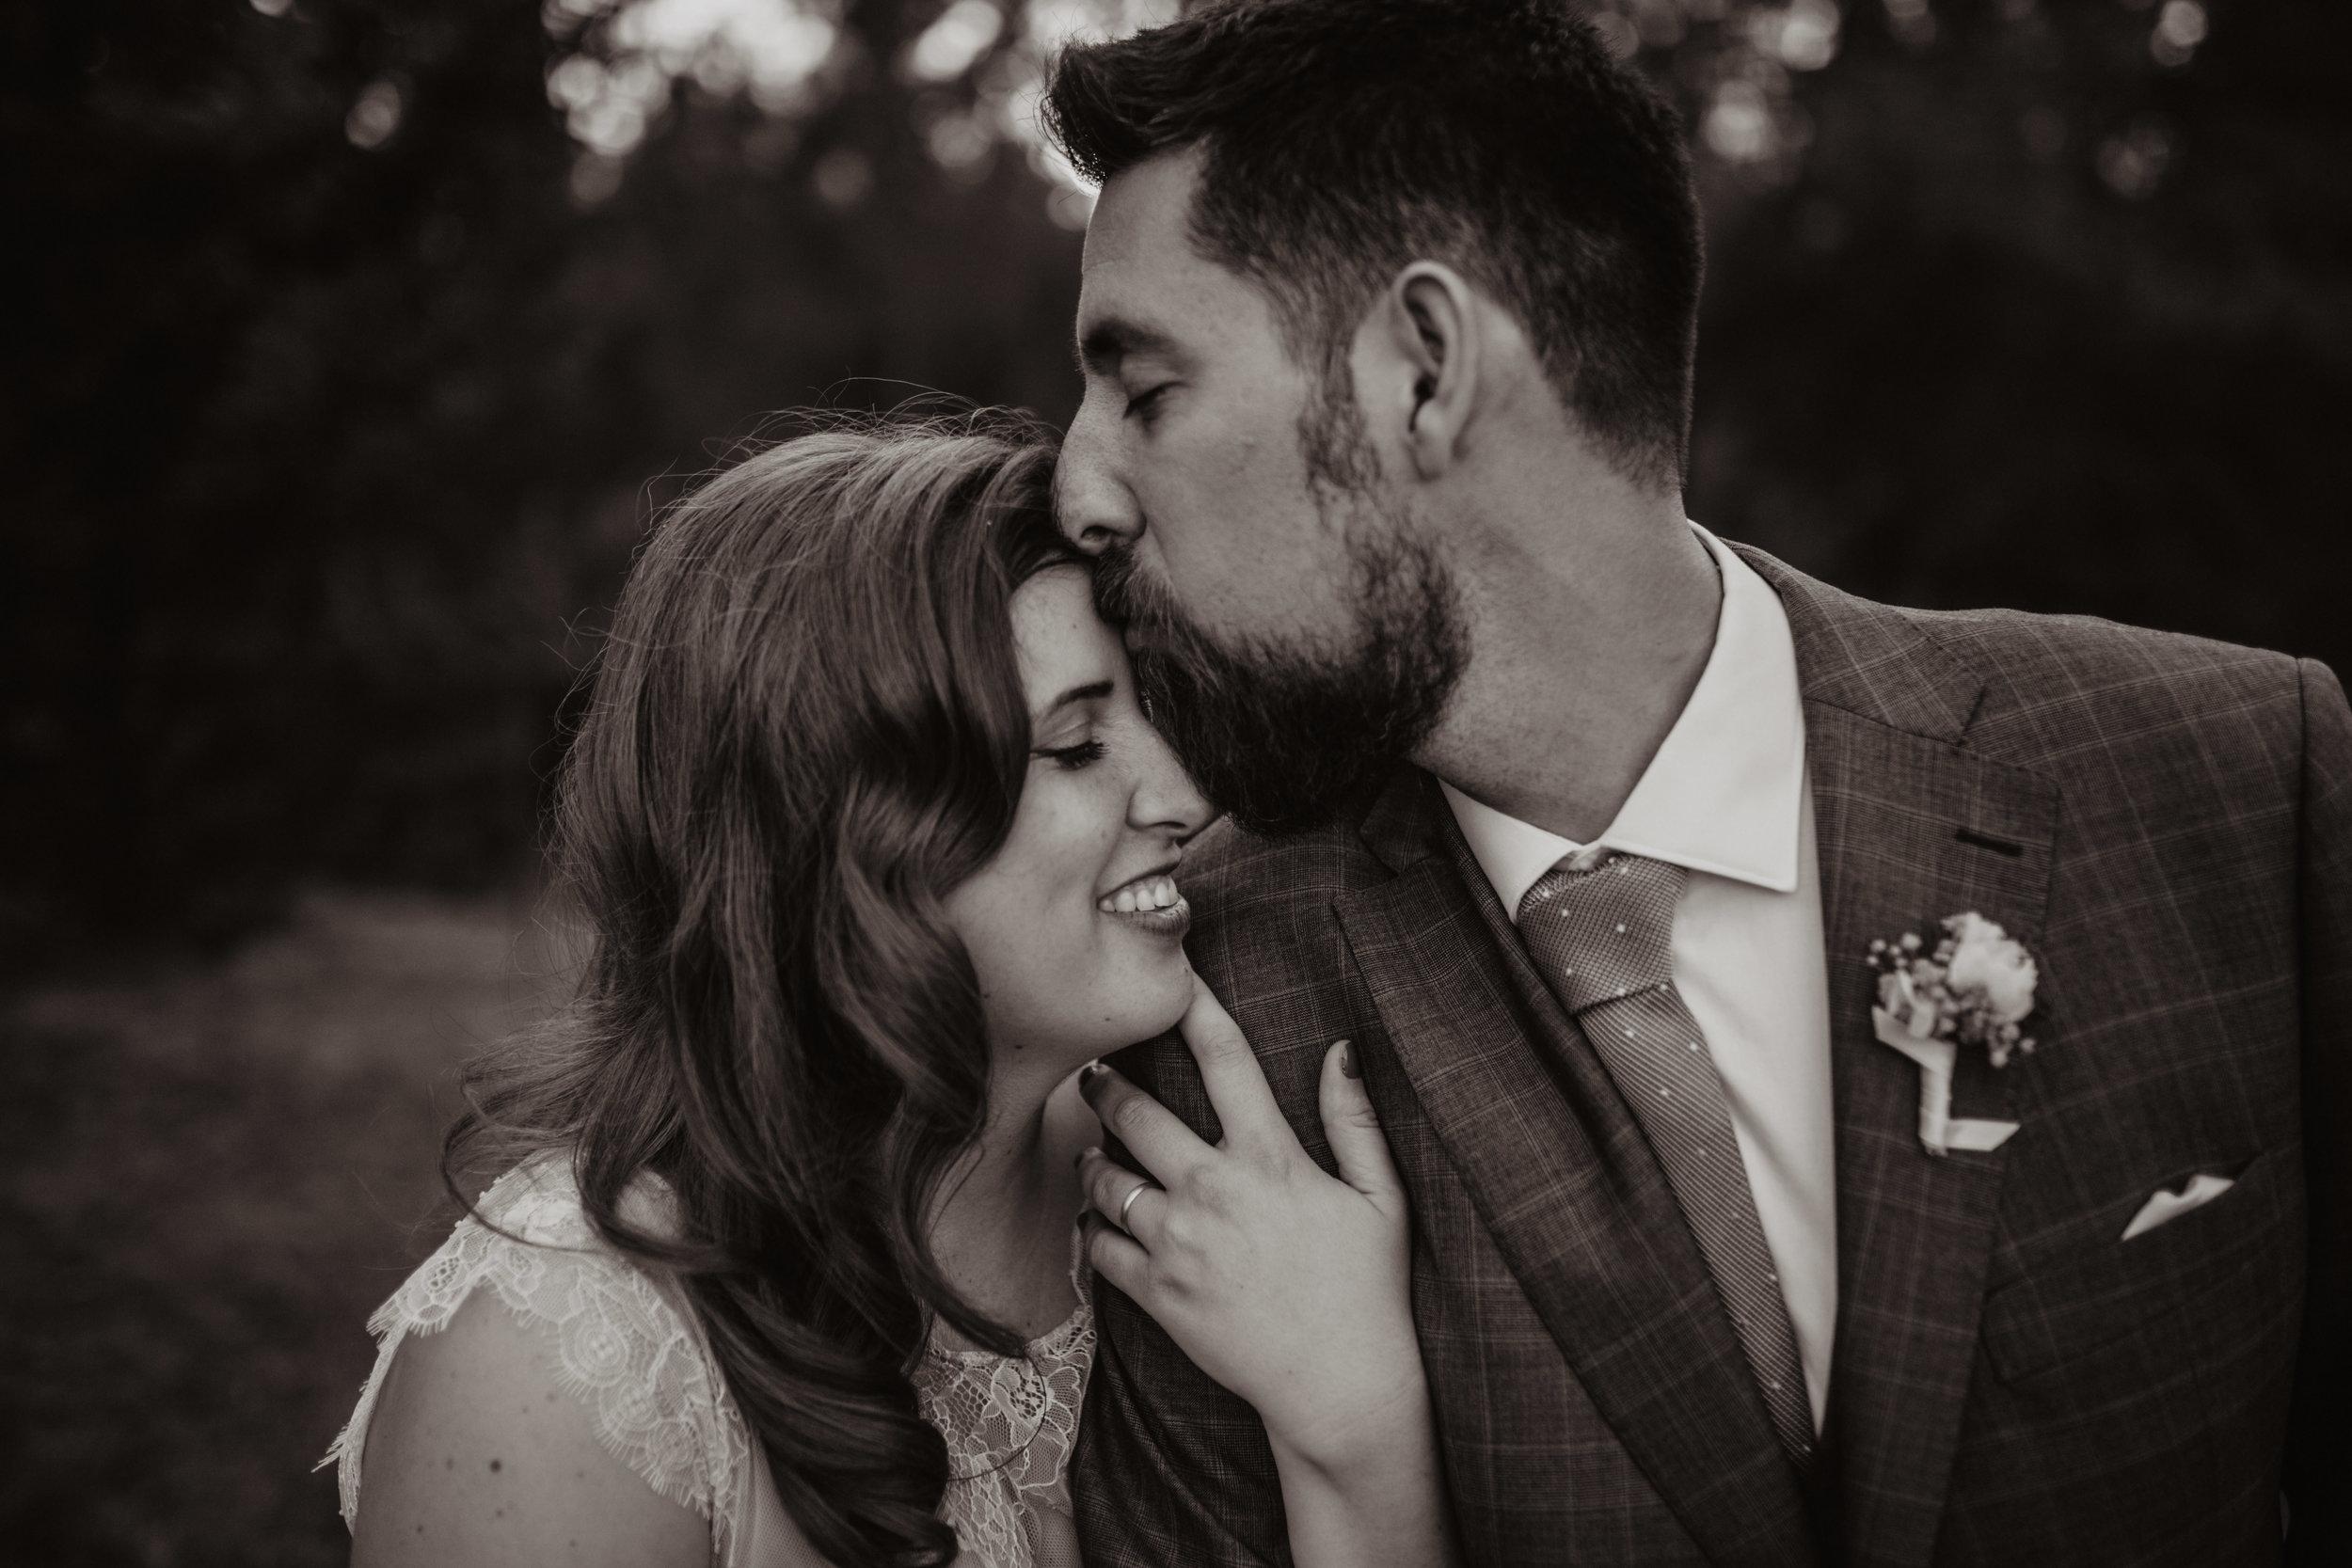 thenortherngirlphotography_photography_thenortherngirl_rebeccascabros_wedding_weddingphotography_masialagarrigadecastelladral_joaniemma_bodaenbarcelona_weddingphotographer_emmaijoan-617.jpg